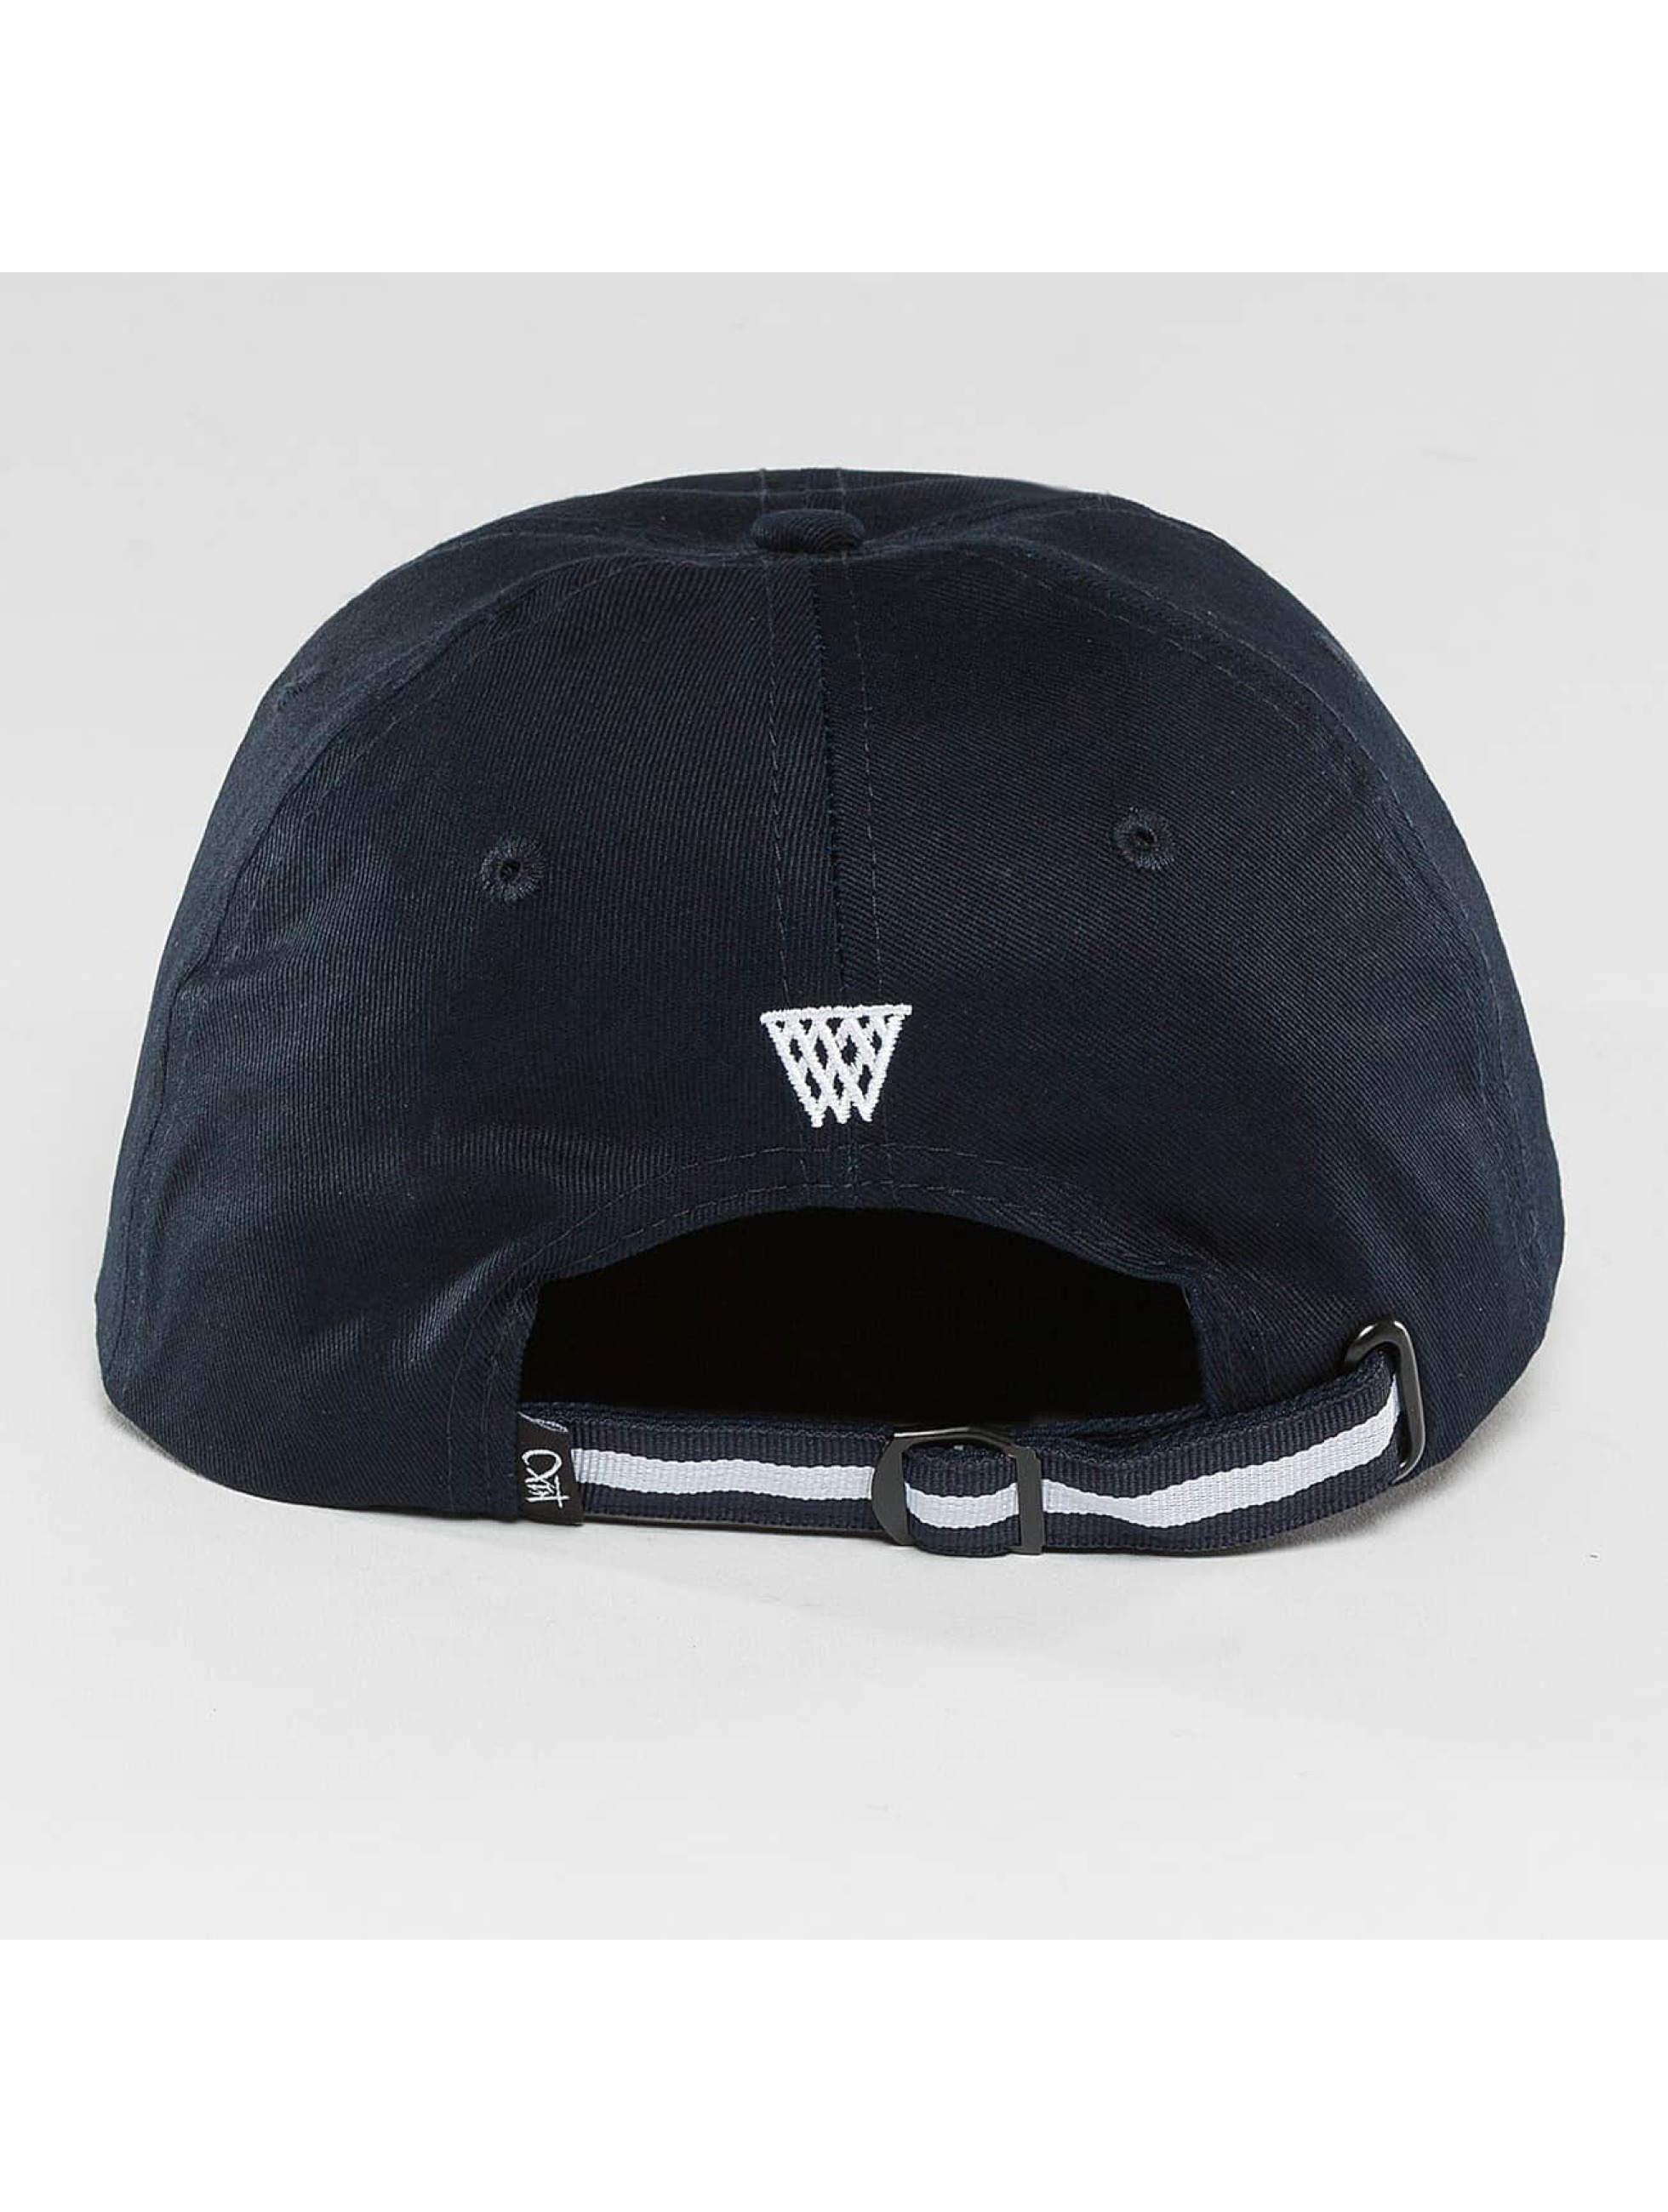 K1X Gorra Snapback Ivey Sports azul